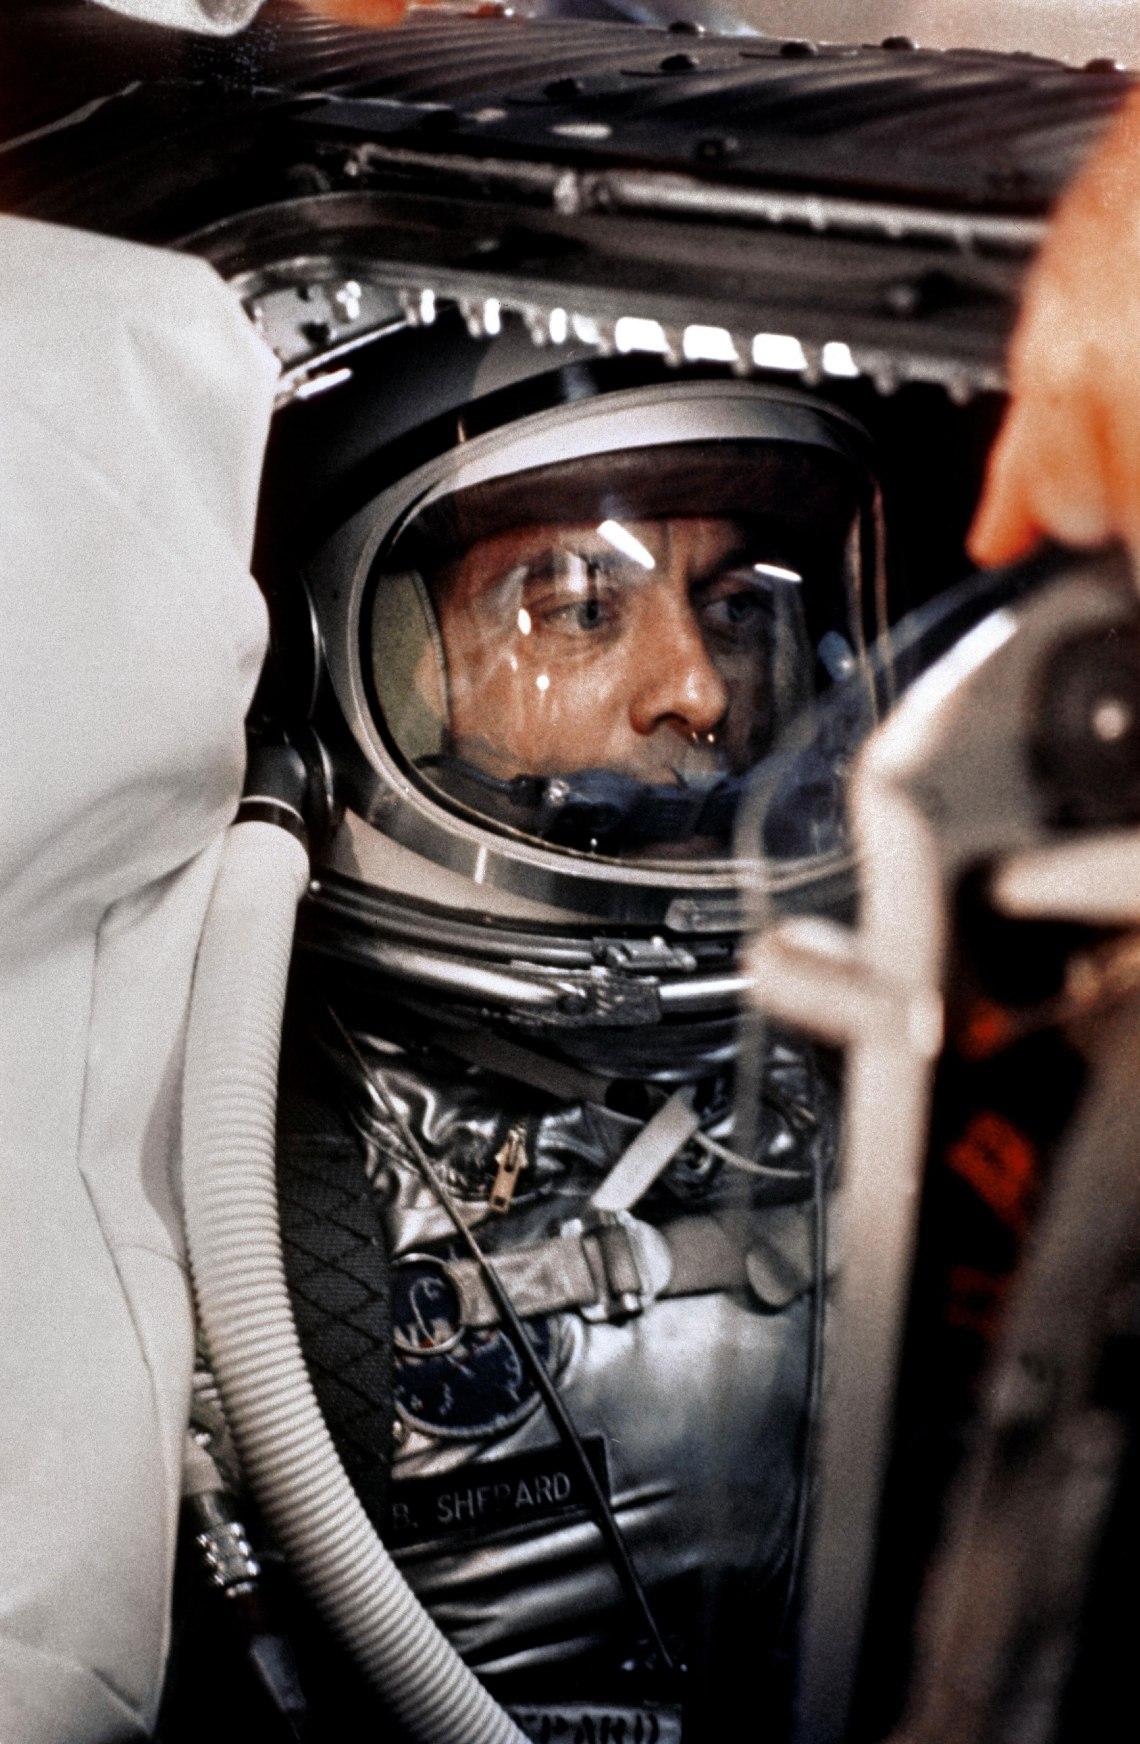 Alan Shepard in his space suit seated inside the Mercur y capsule. Credit: NASA/Bill Taub